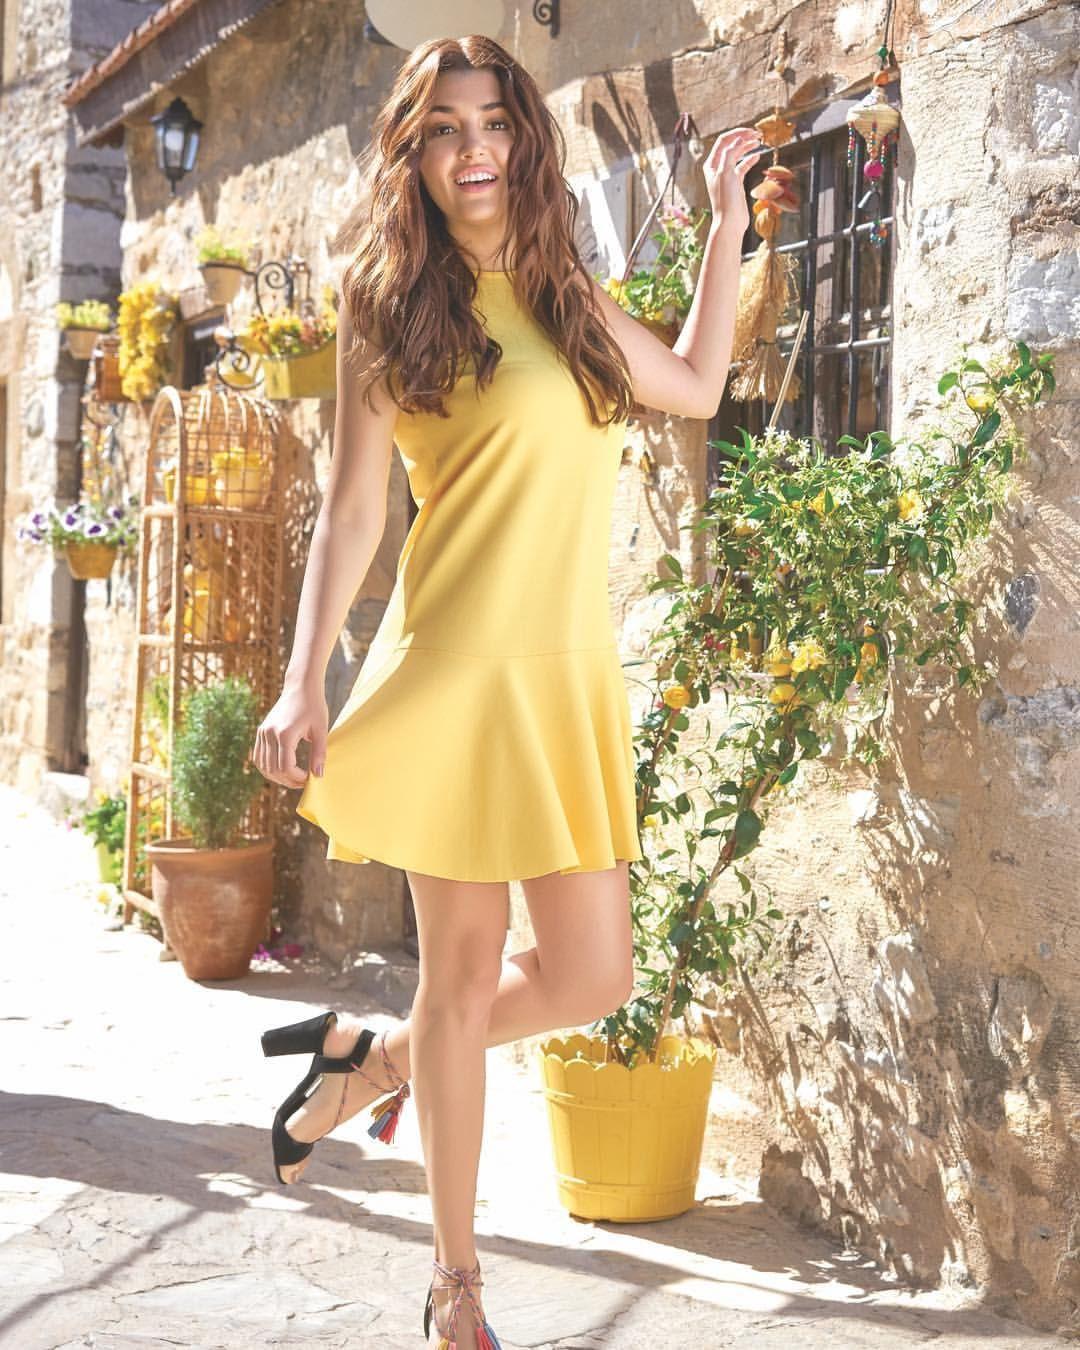 14 3k Likes 204 Comments Defacto Defactoofficial On Instagram Bizler De Sizin Kadar Heyecanliyiz Yeni R Hande Ercel Photography Poses Women Actresses